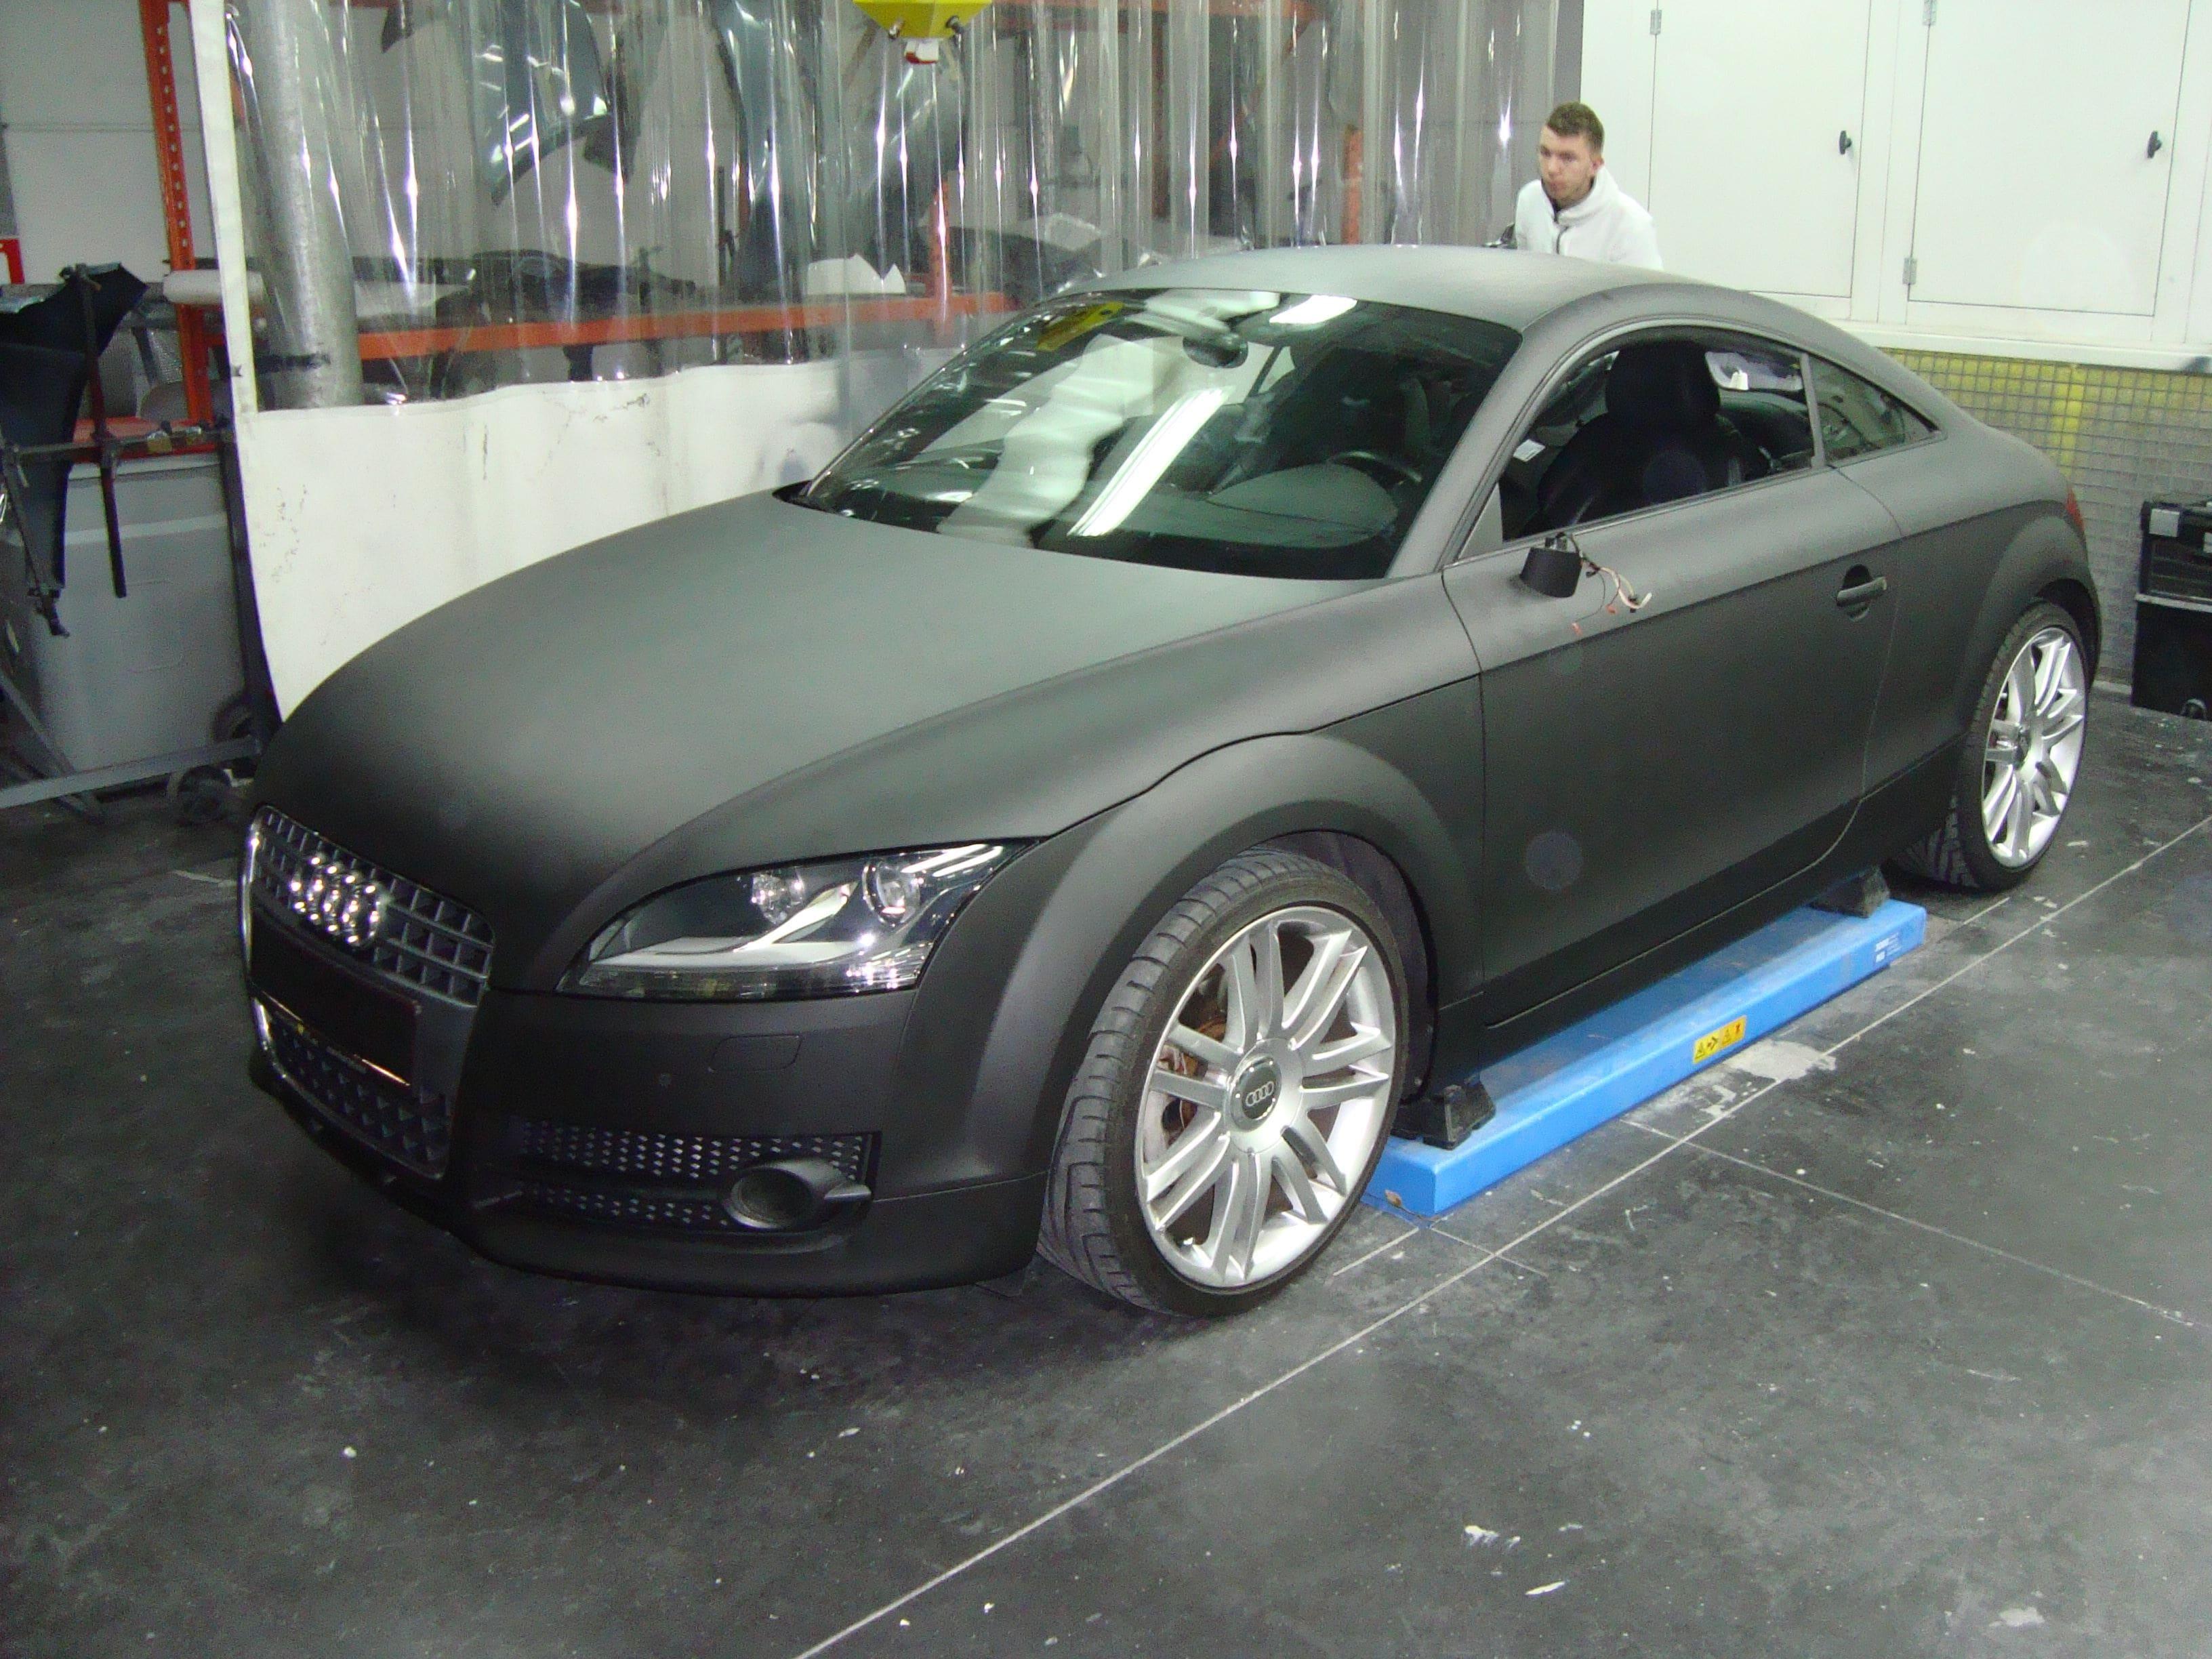 Audi TT met Mat Zwarte Wrap, Carwrapping door Wrapmyride.nu Foto-nr:5107, ©2021